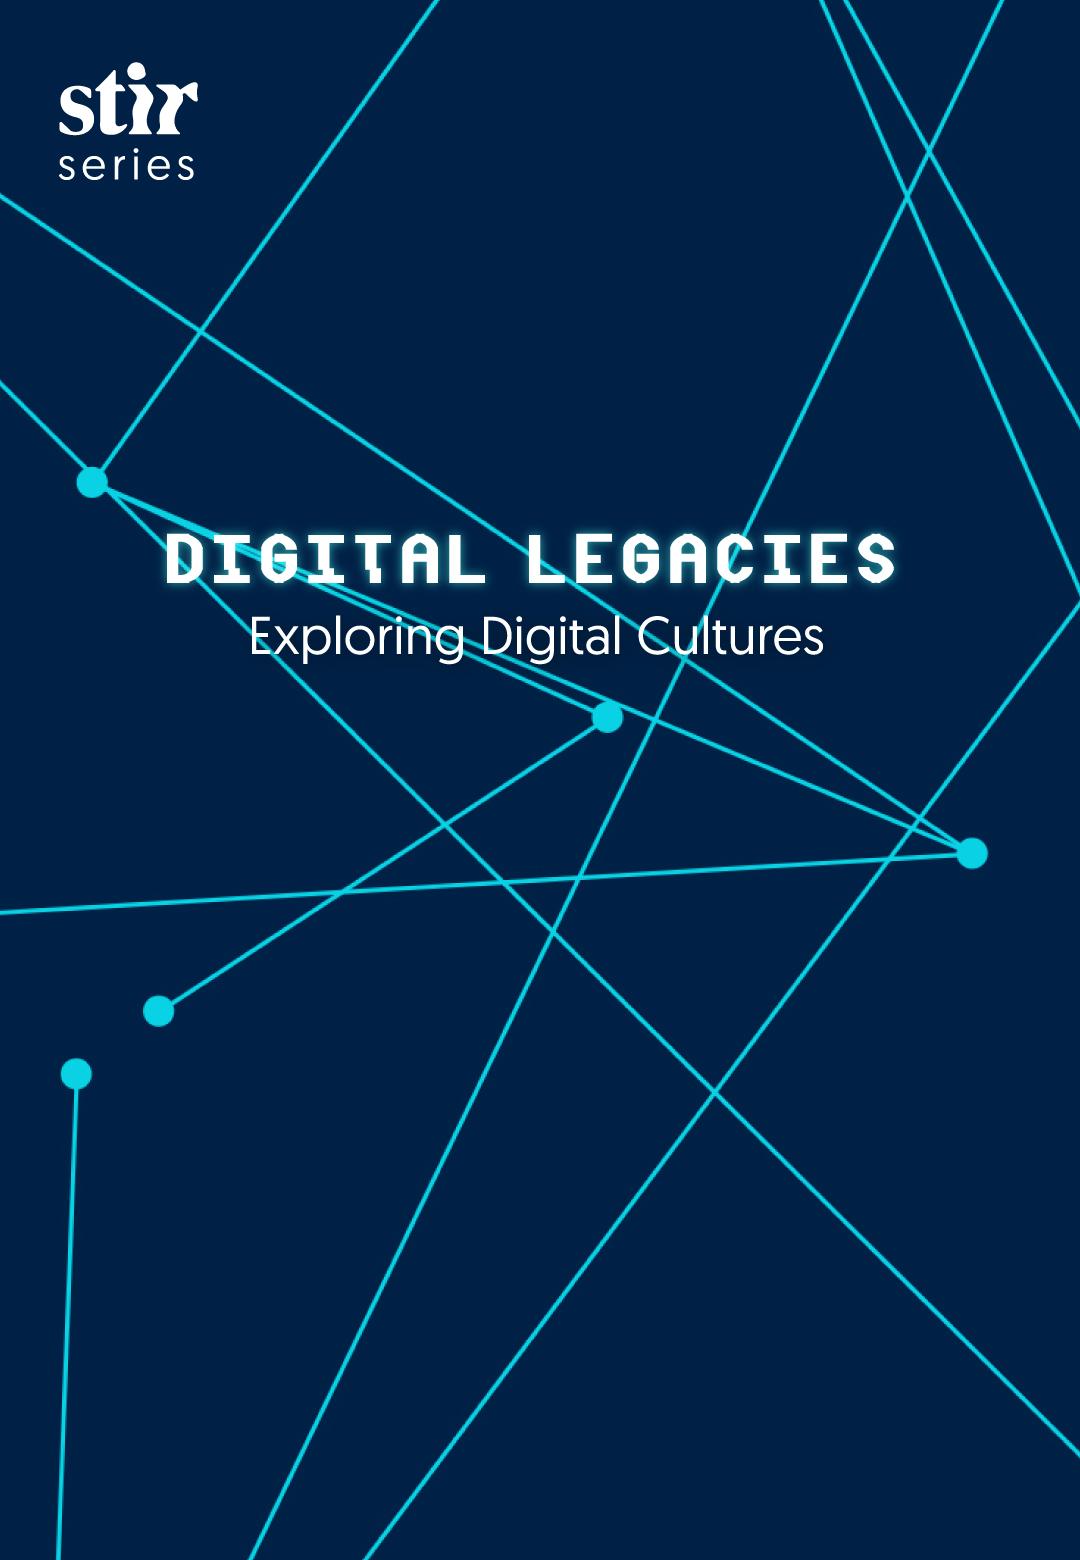 Digital Legcies, a series by Julius Wiedemann | STIRworld